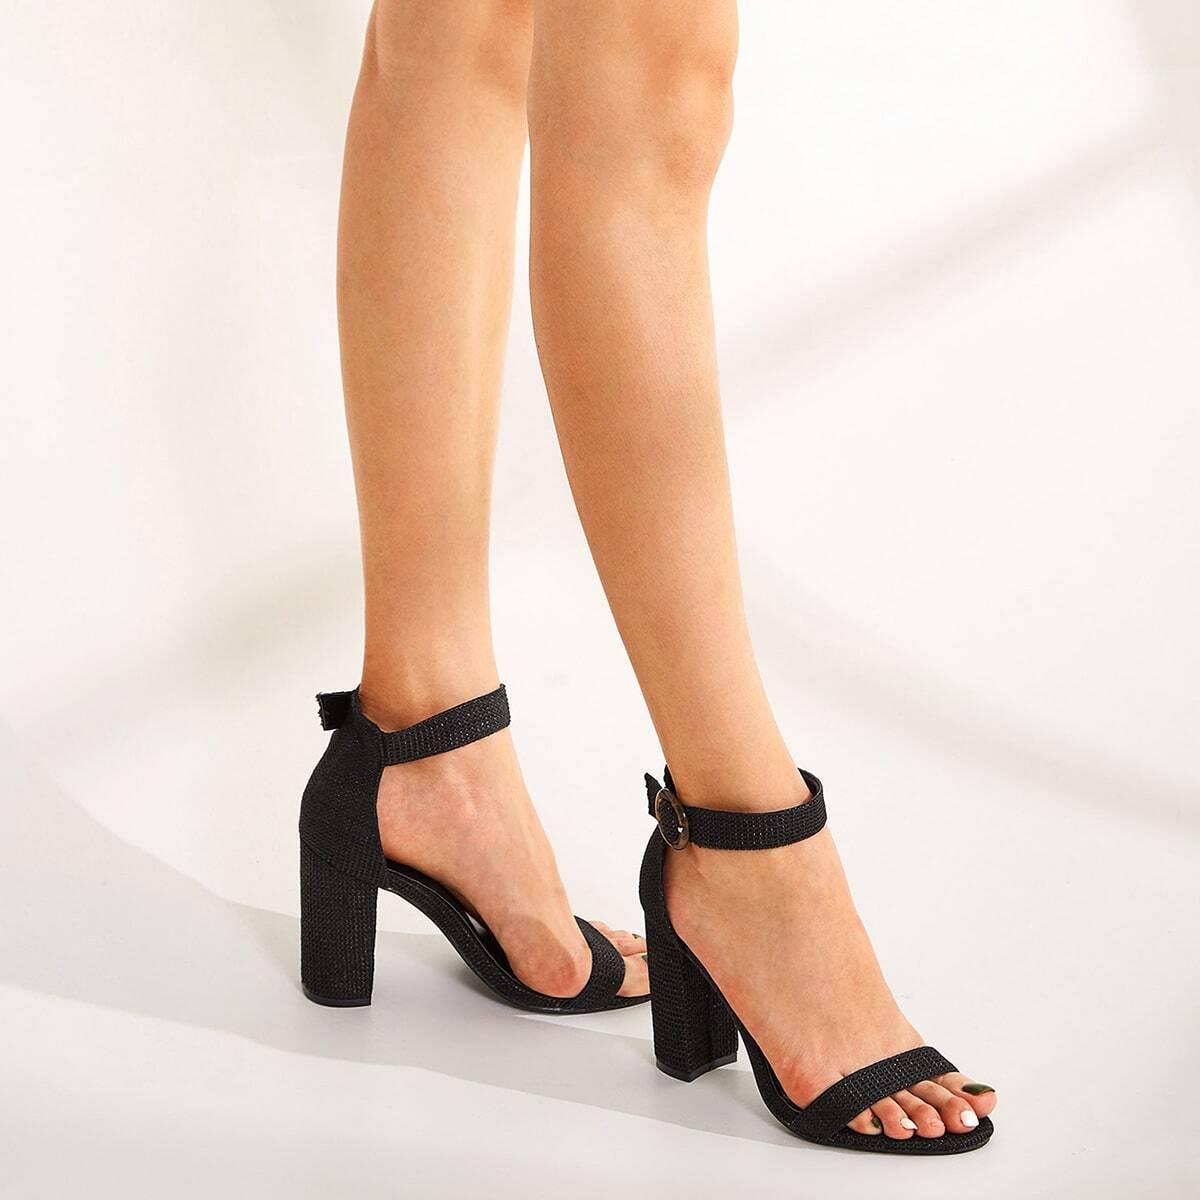 Туфли на толстом каблуке с ремешком от SHEIN